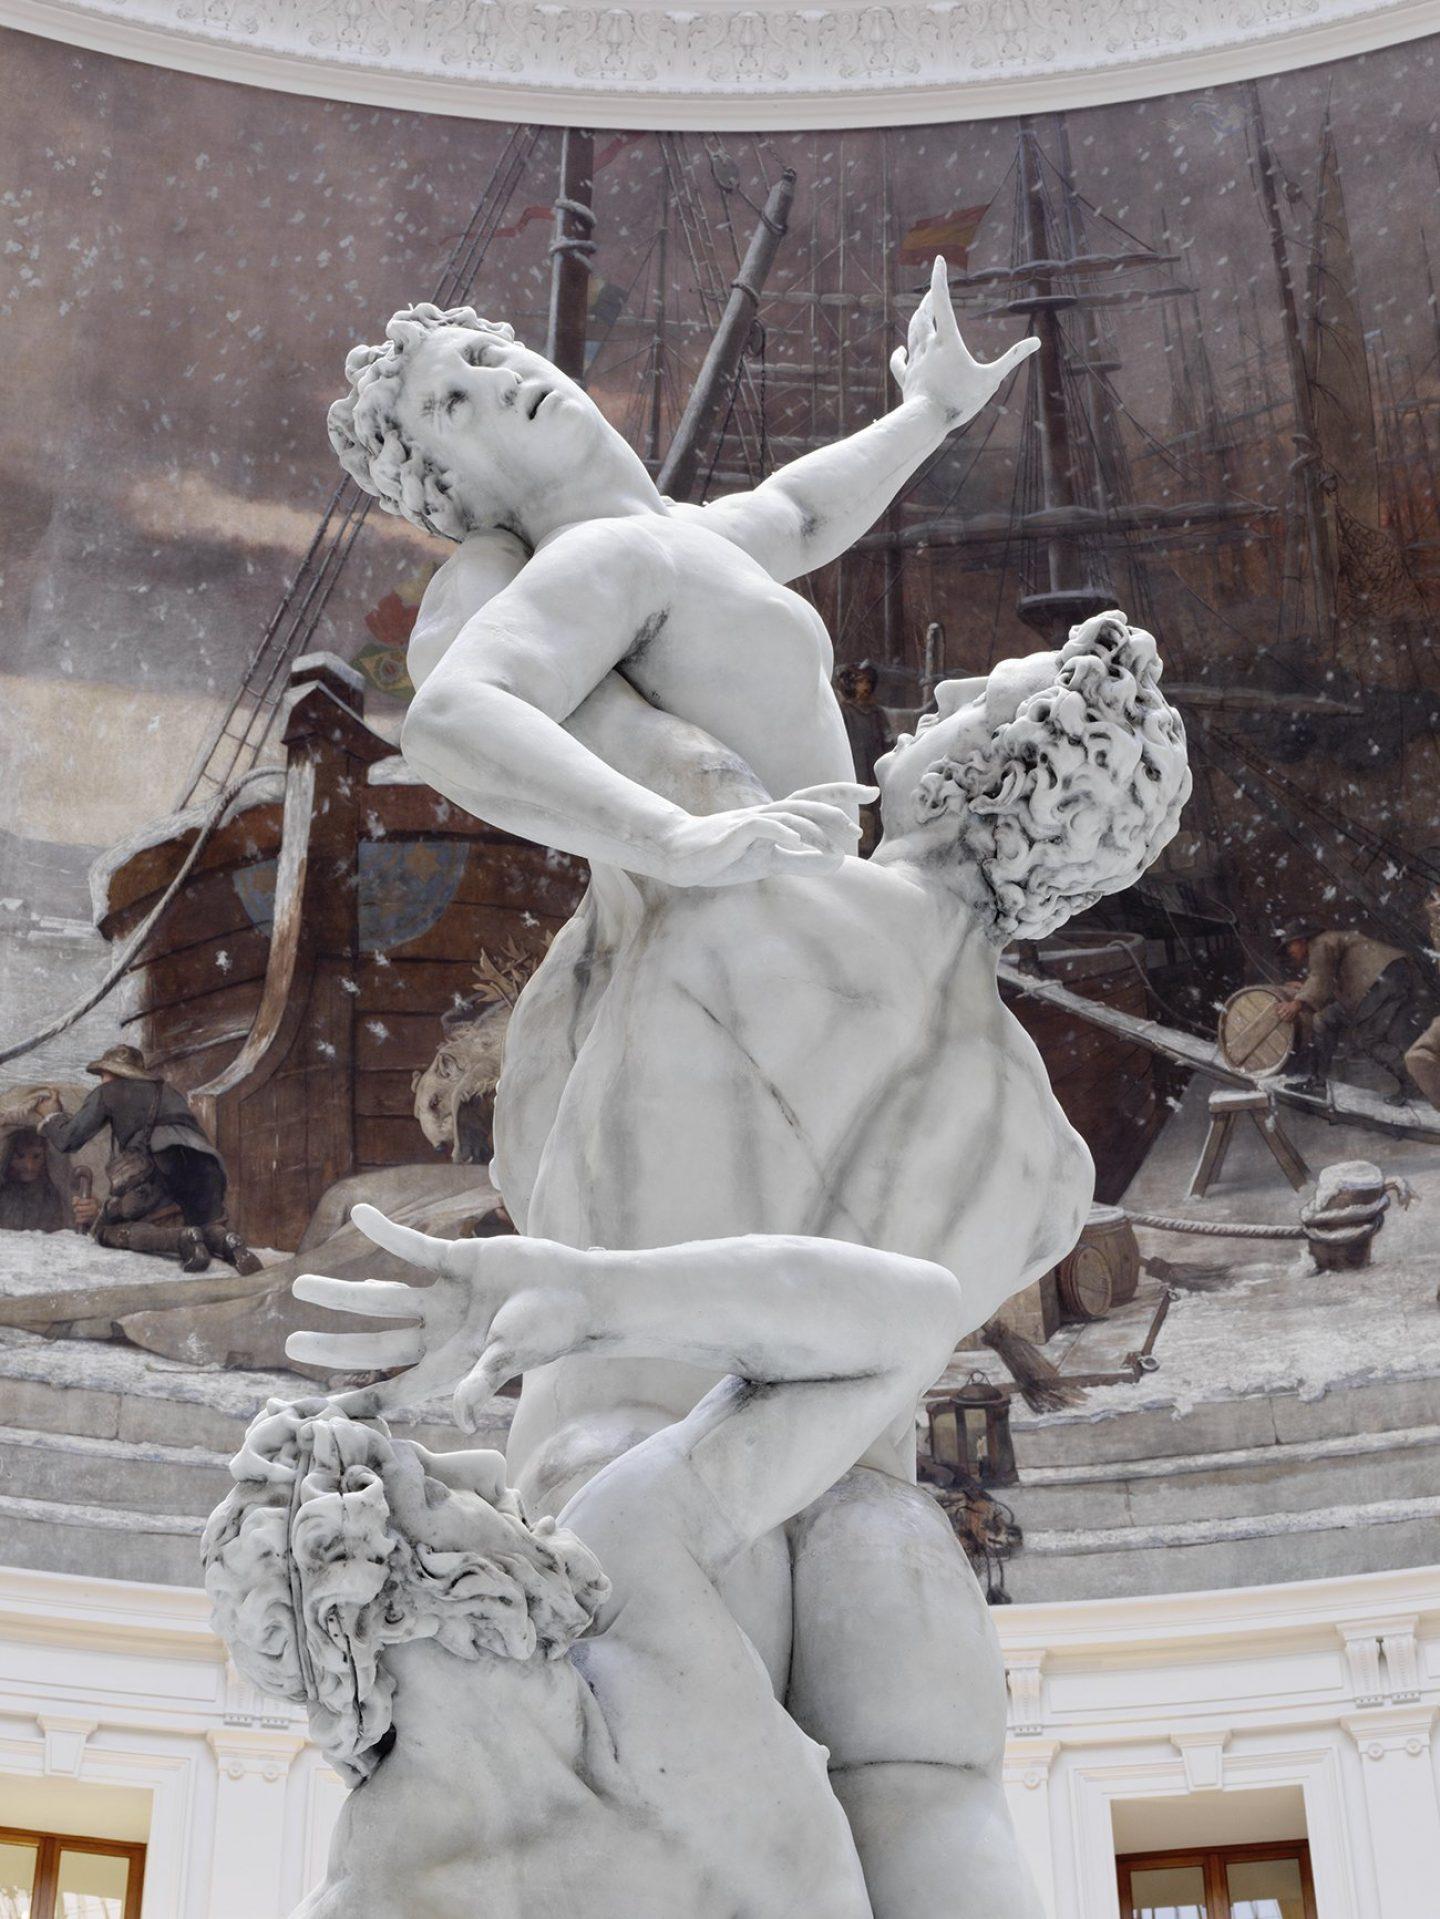 IGNANT-Art-Urs-Fischer-Pinault-Collection-01